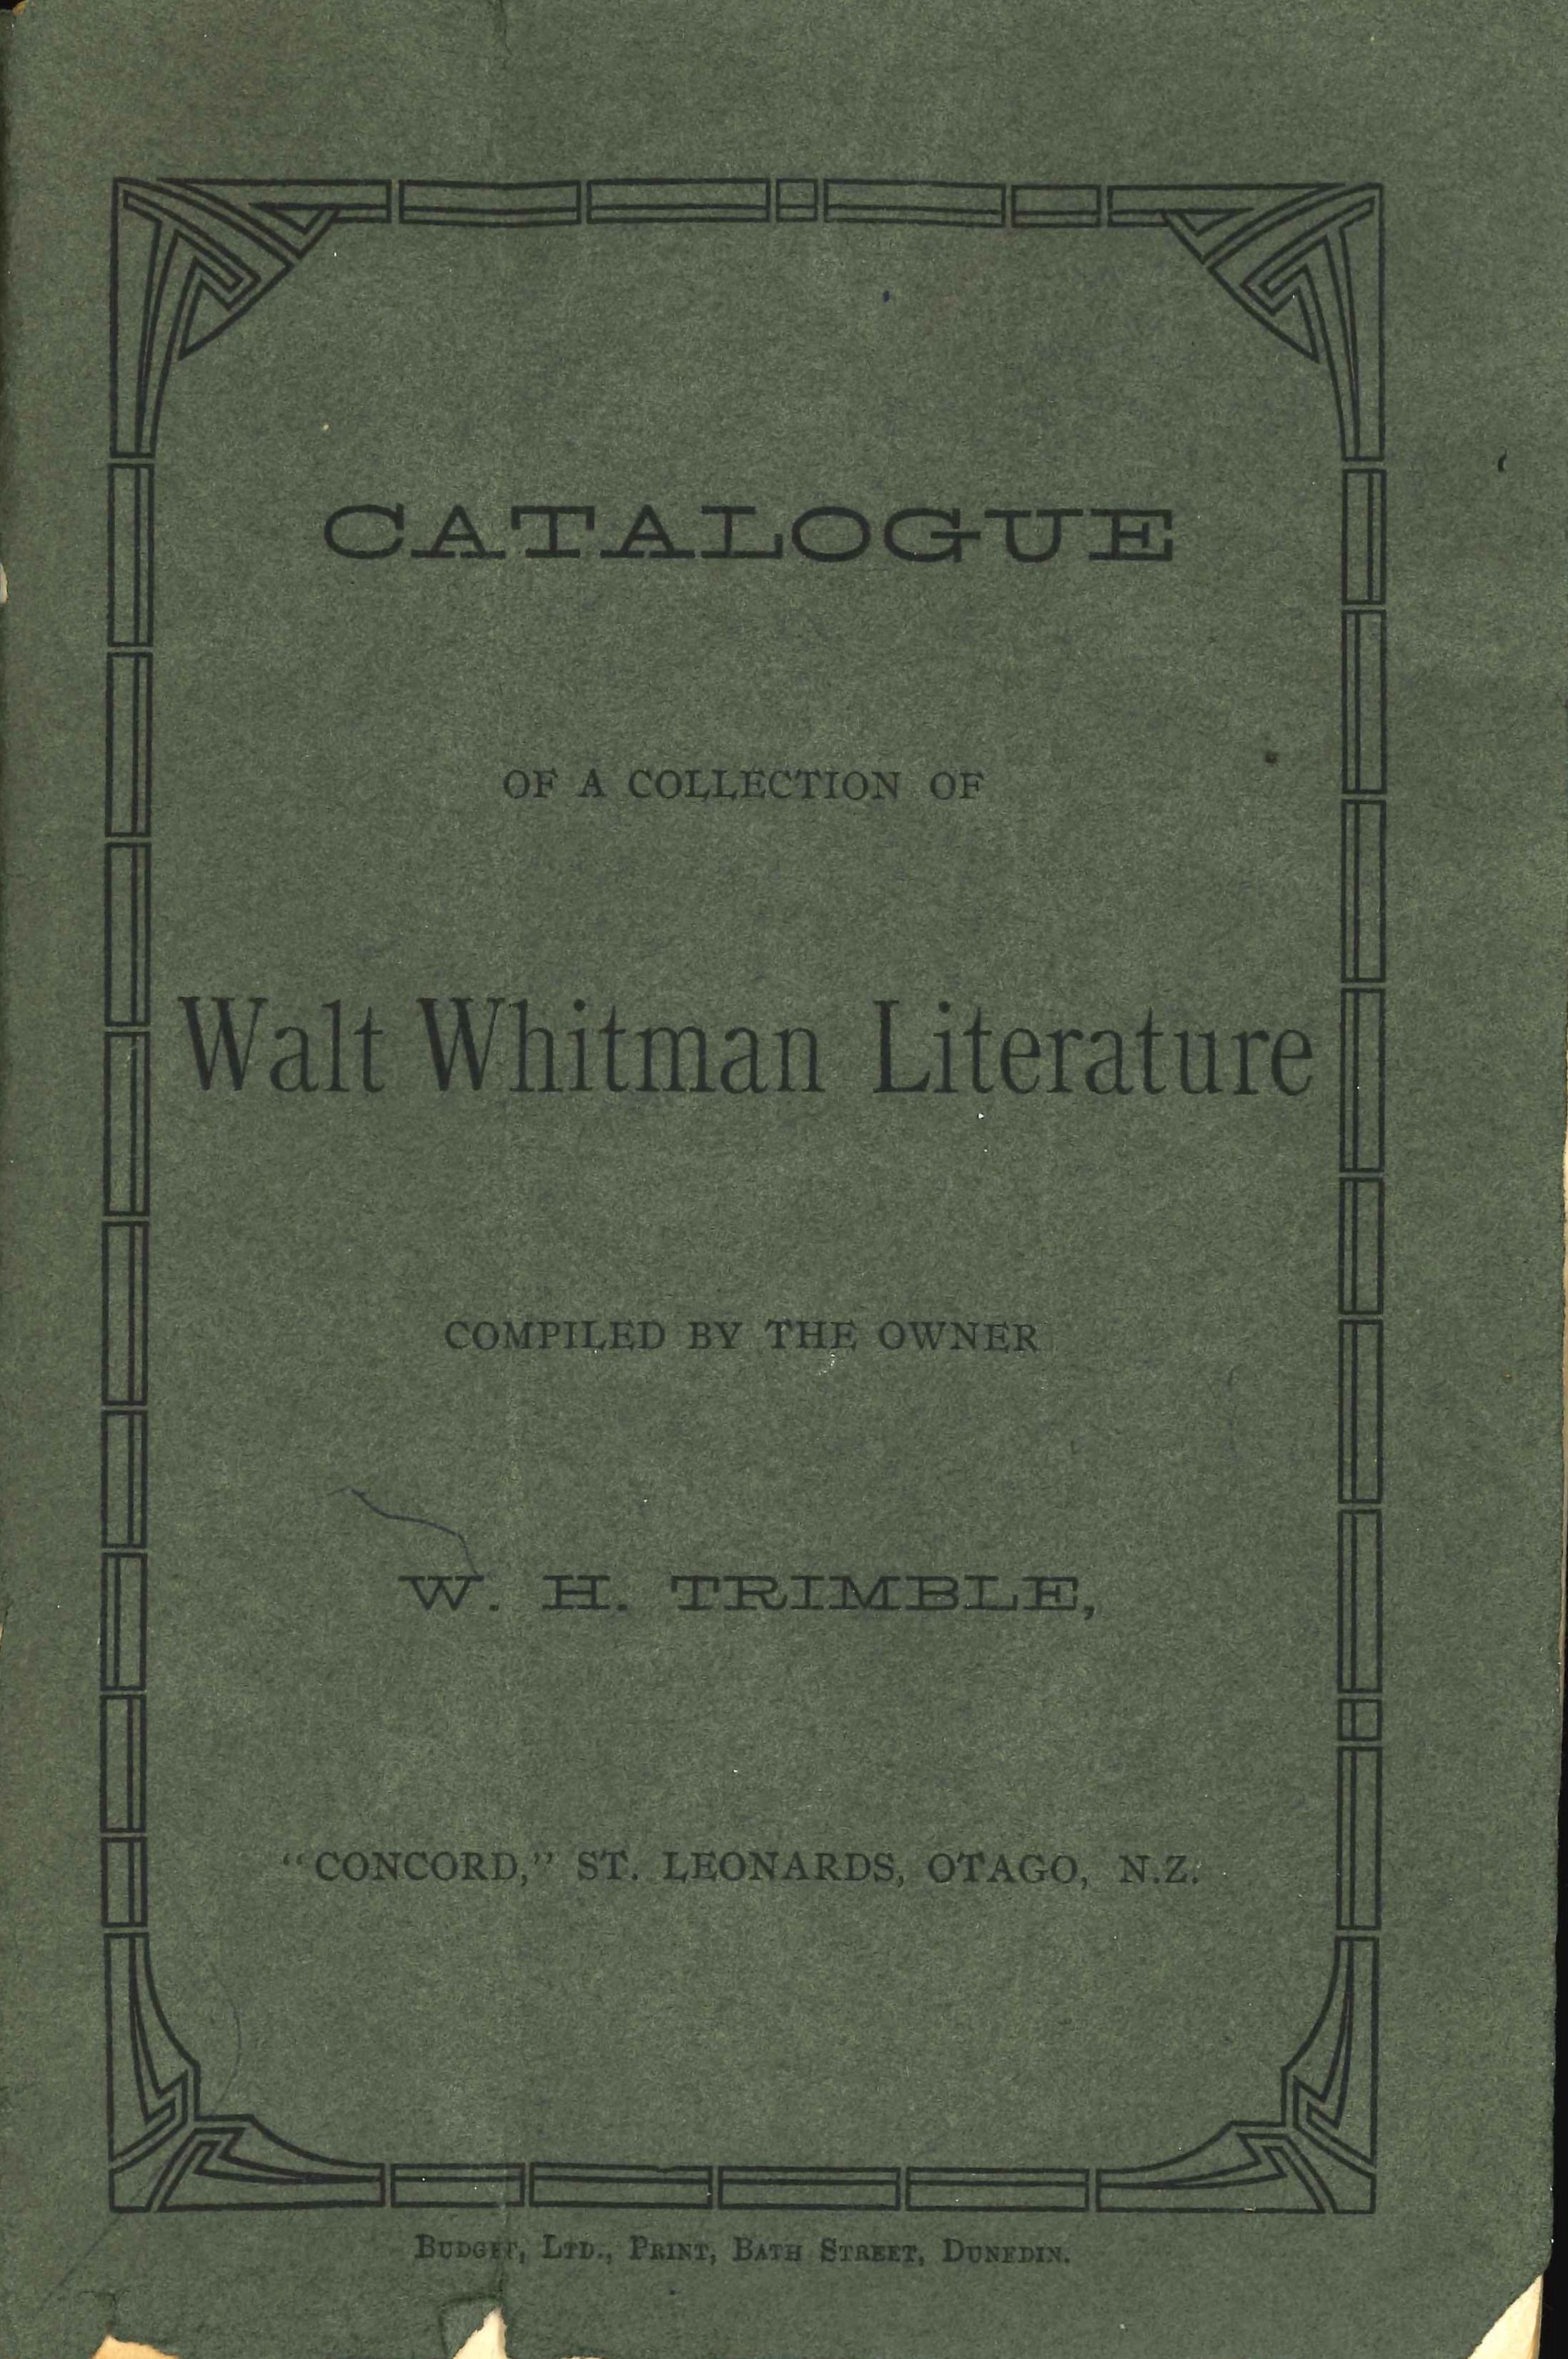 W.H. Trimble. Catalogue of a Collection of Walt Whitman Literature. St Leonards, Otago, 1912.